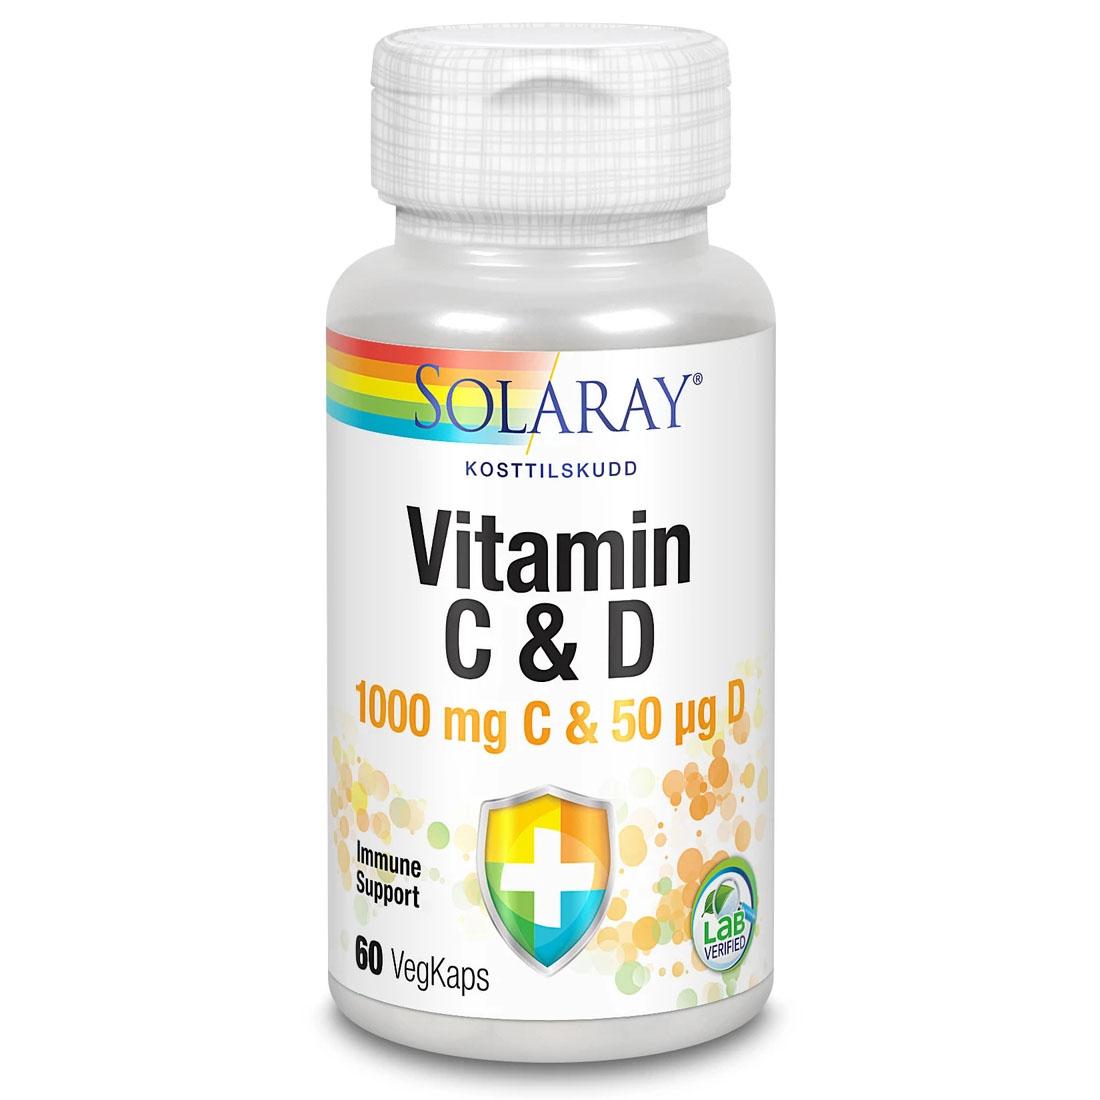 Solaray vitamin C & D 60 kap